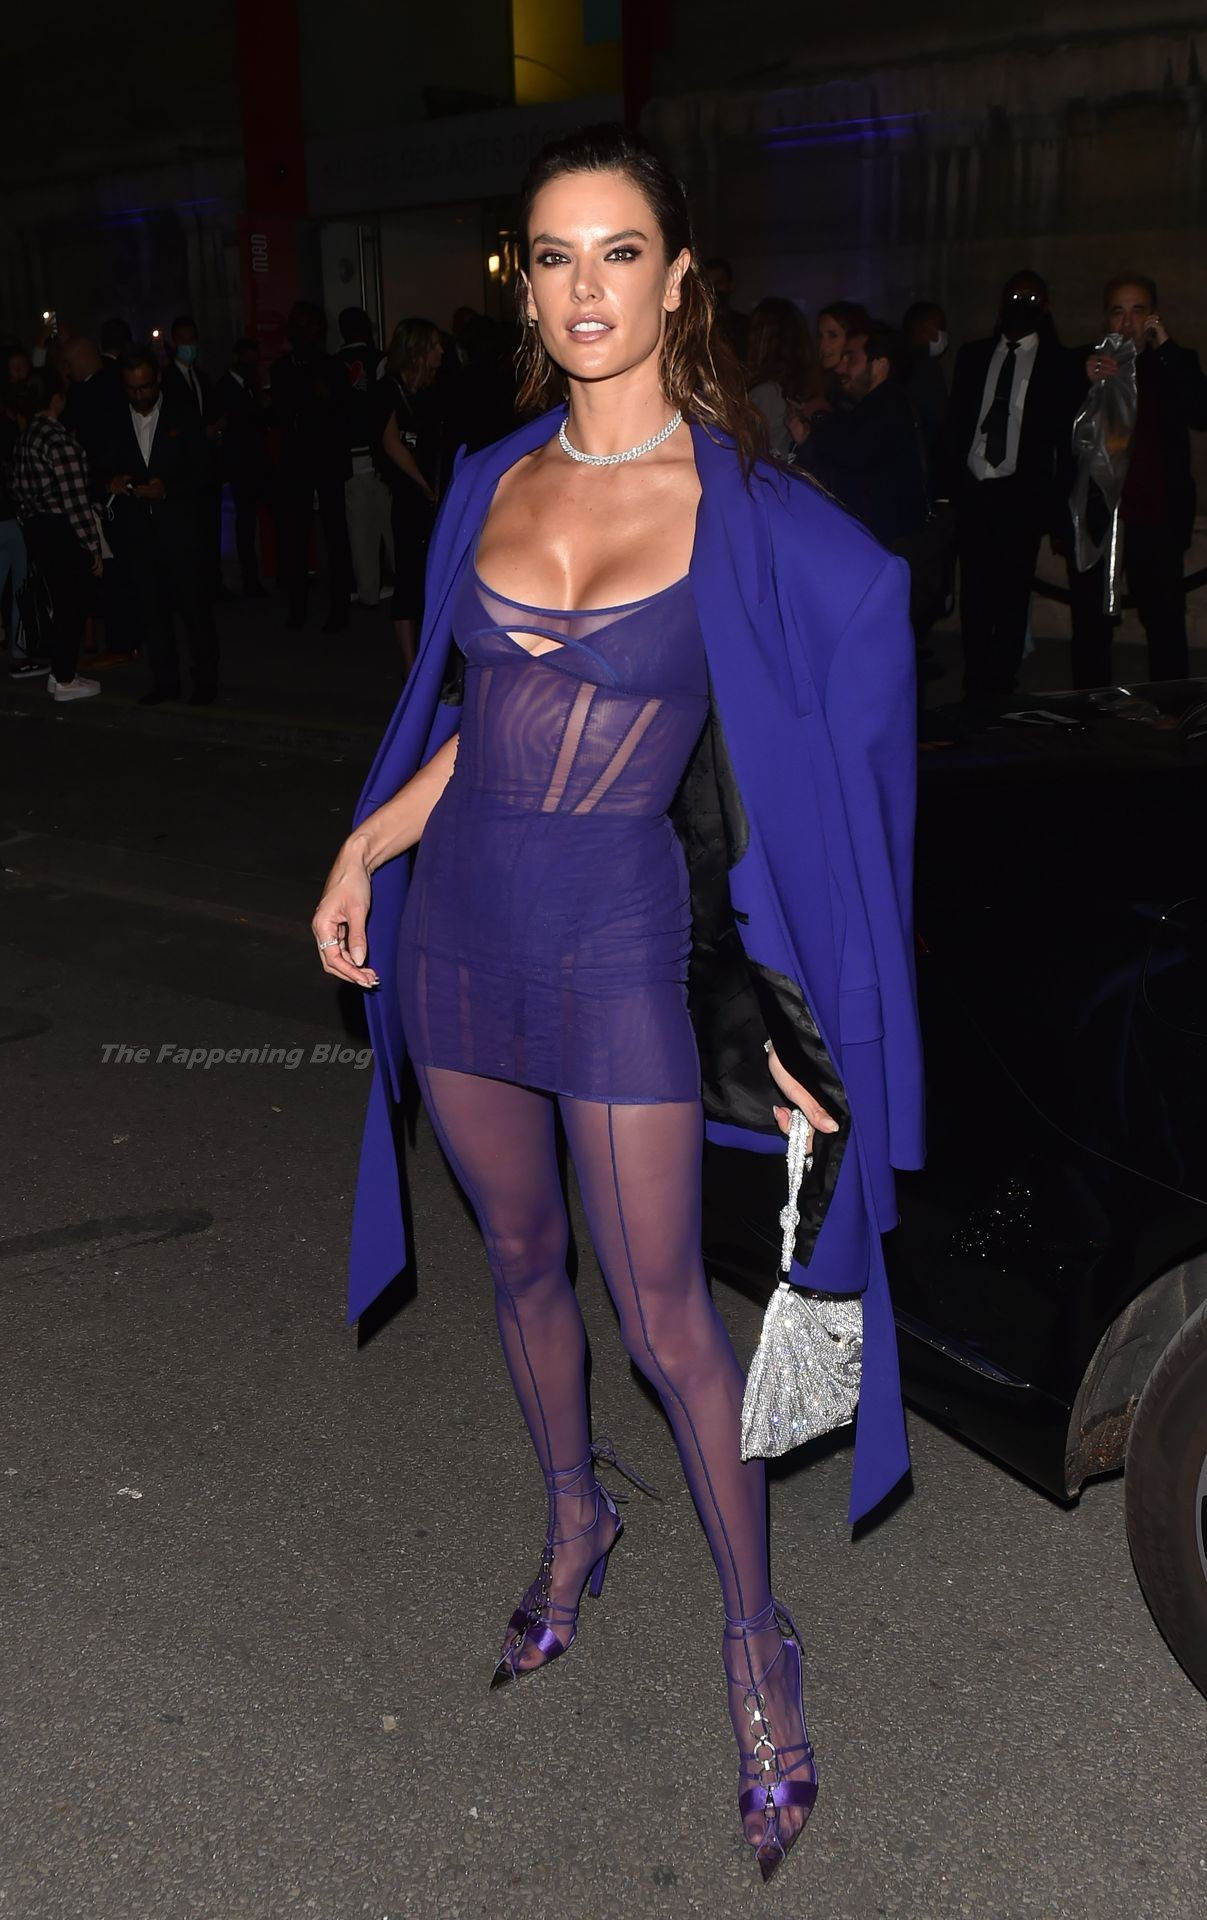 Alessandra-Ambrosio-Sexy-The-Fappening-Blog-75-1.jpg